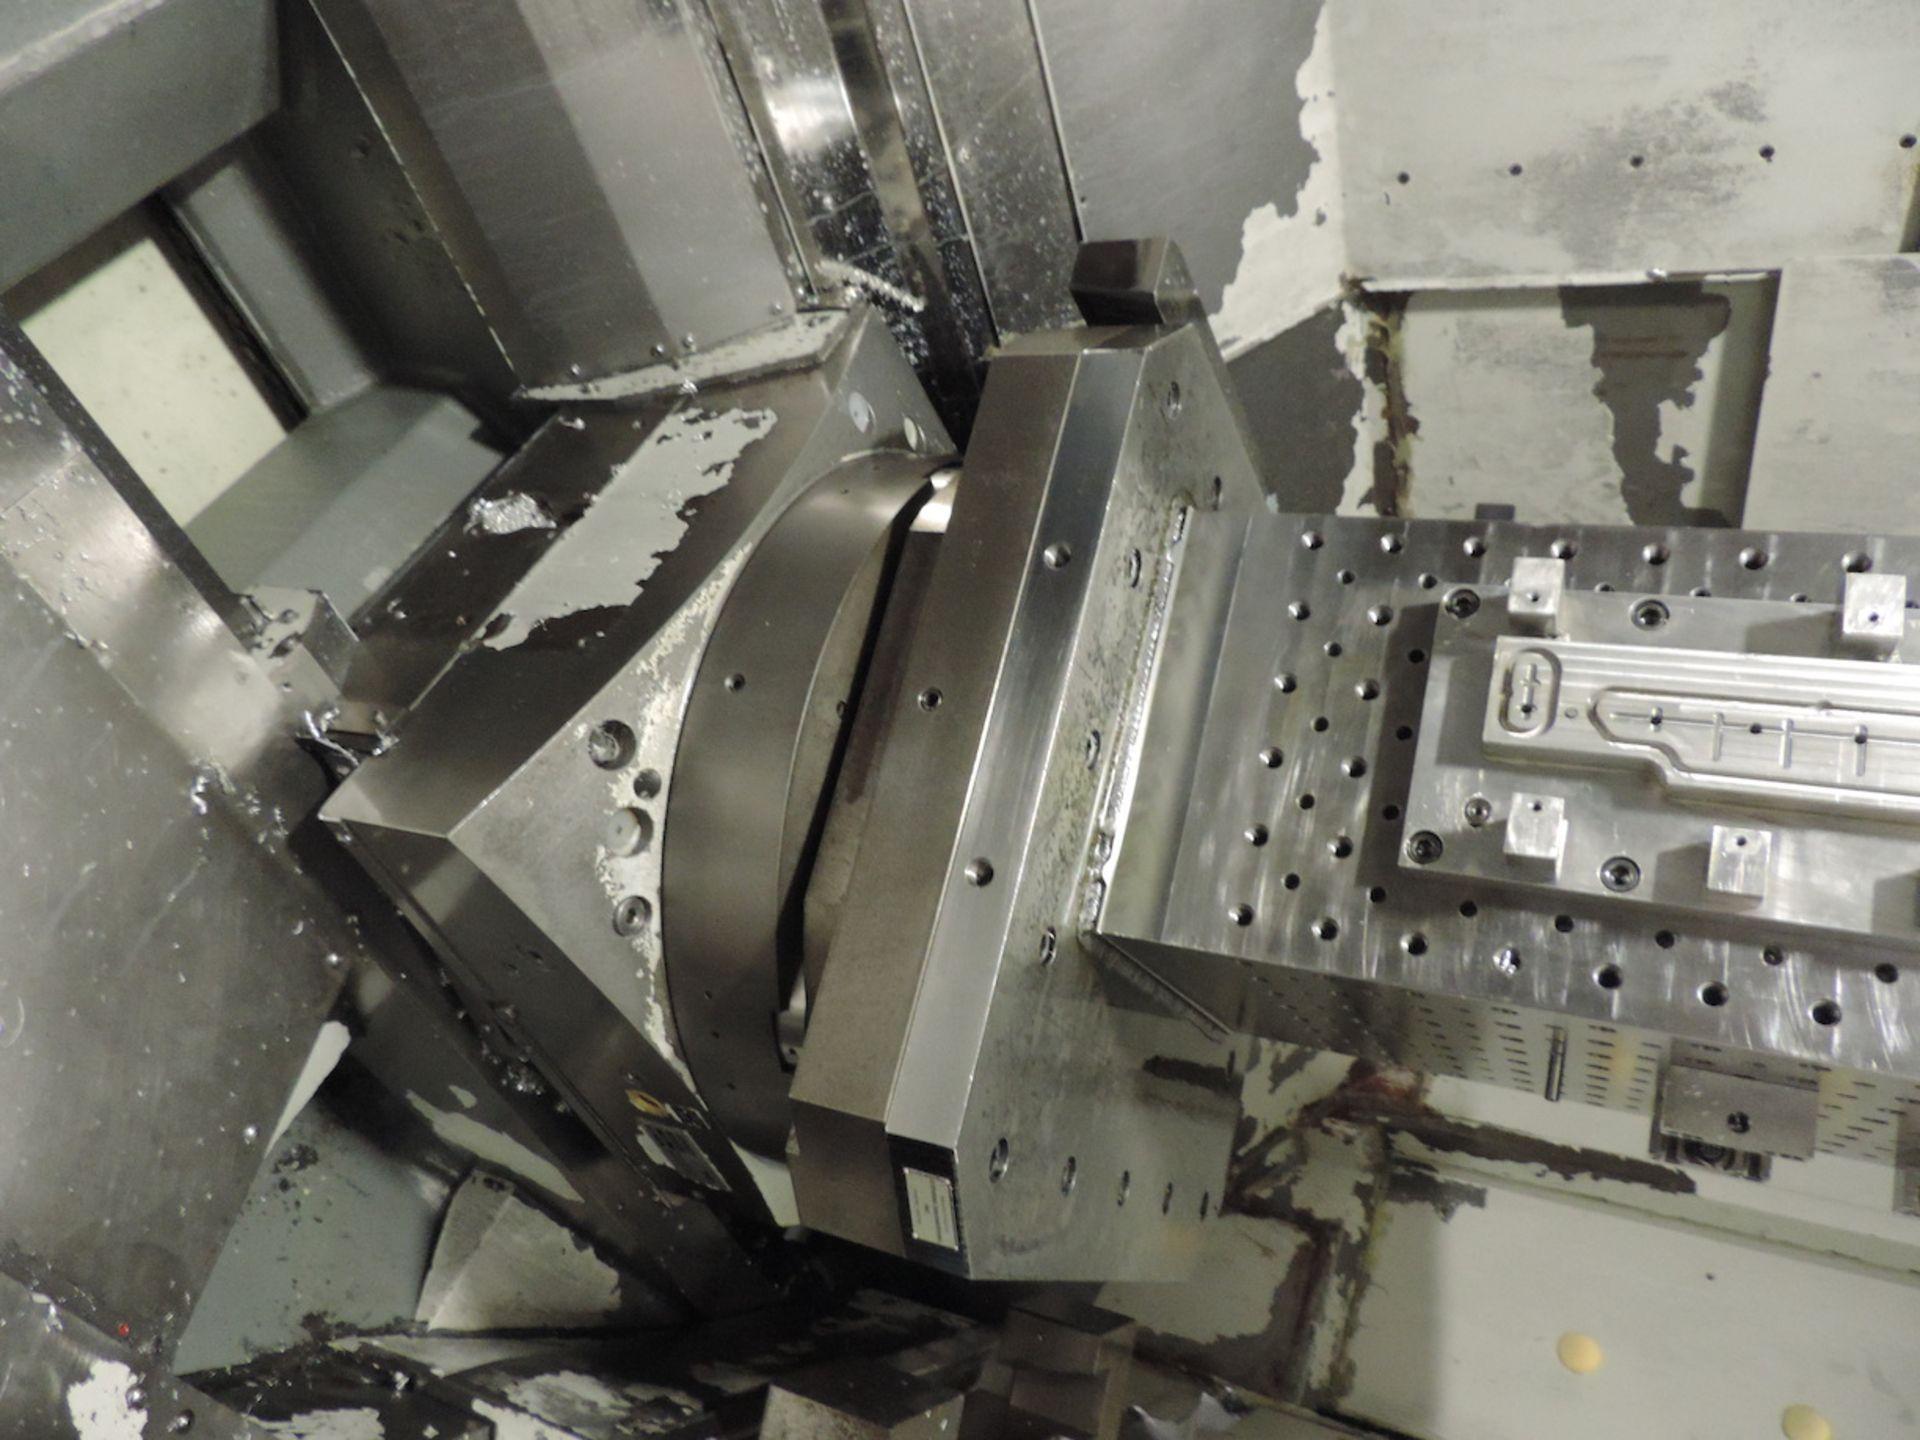 "2002 STARRAG & HECKERT CWK-630D HMC, GE FANUC 16i-M CONTROL, XYZ TRAVELS: 41"" X 39"" X 45"", 24.8"" X - Image 6 of 20"